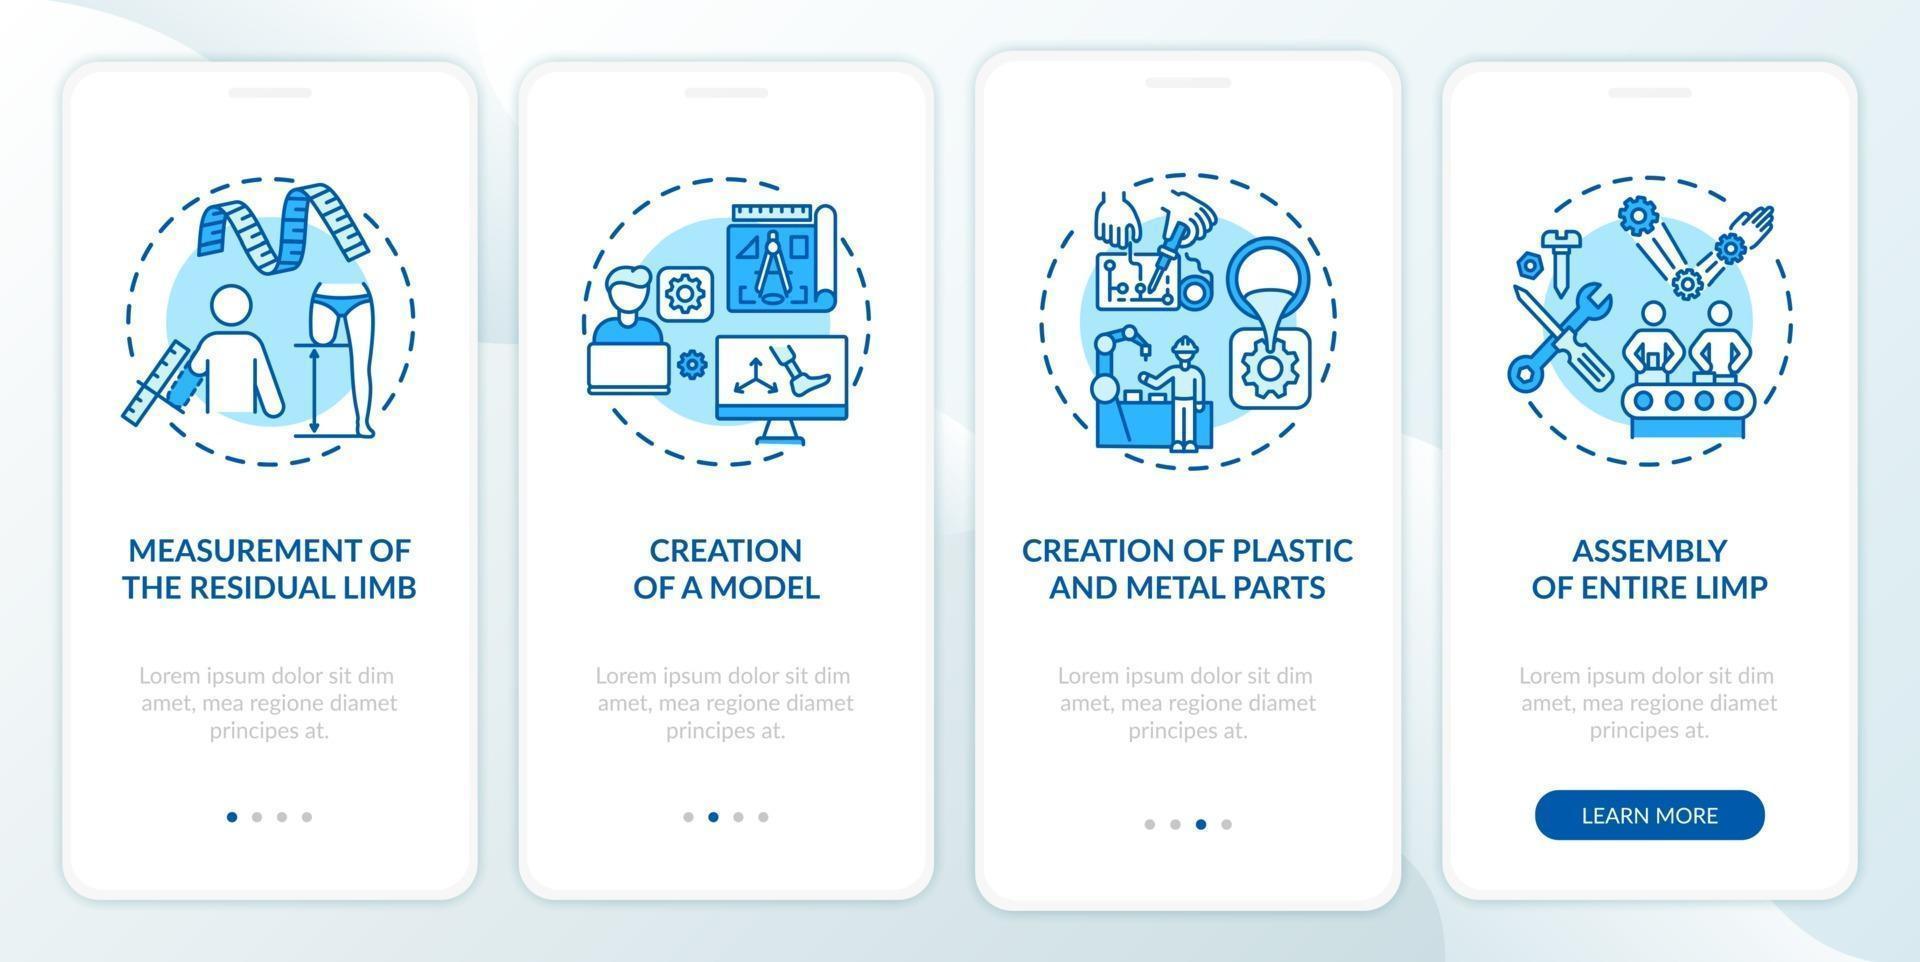 Prothetik Herstellung Onboarding Mobile App Seite Bildschirm mit Konzepten vektor